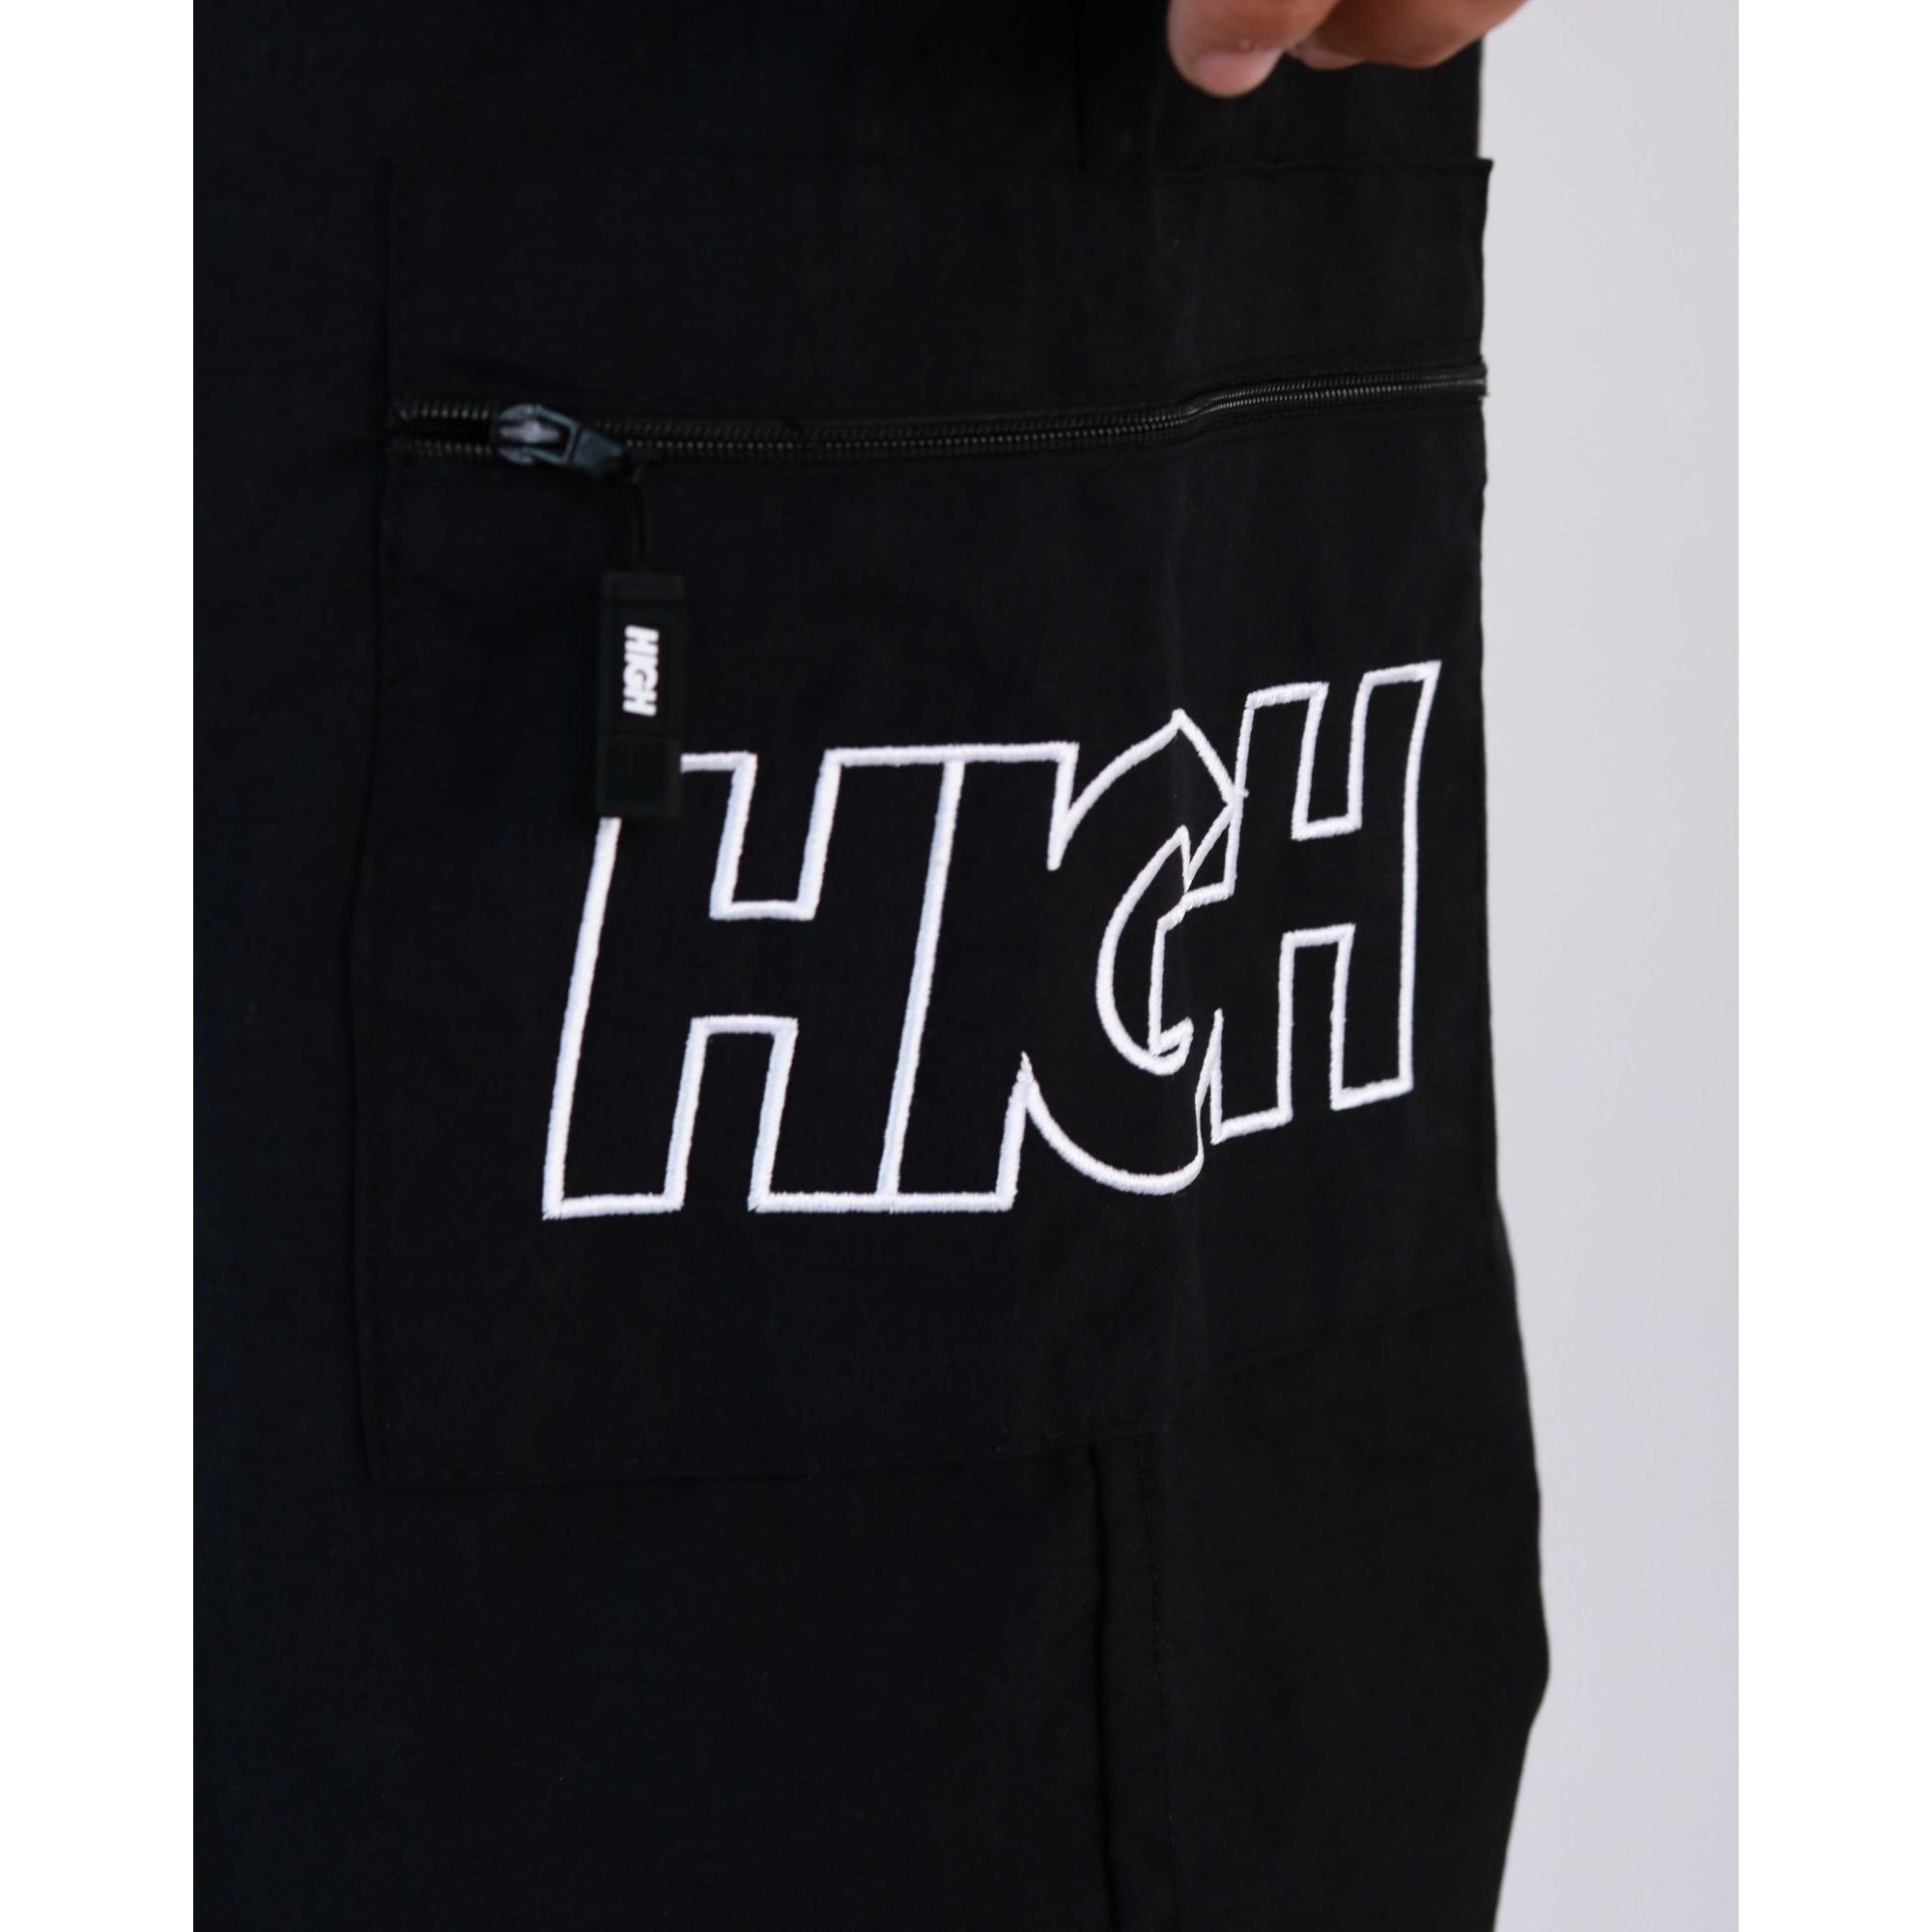 CALCA HIGH CARGO TRACK TP024.01 - PTO